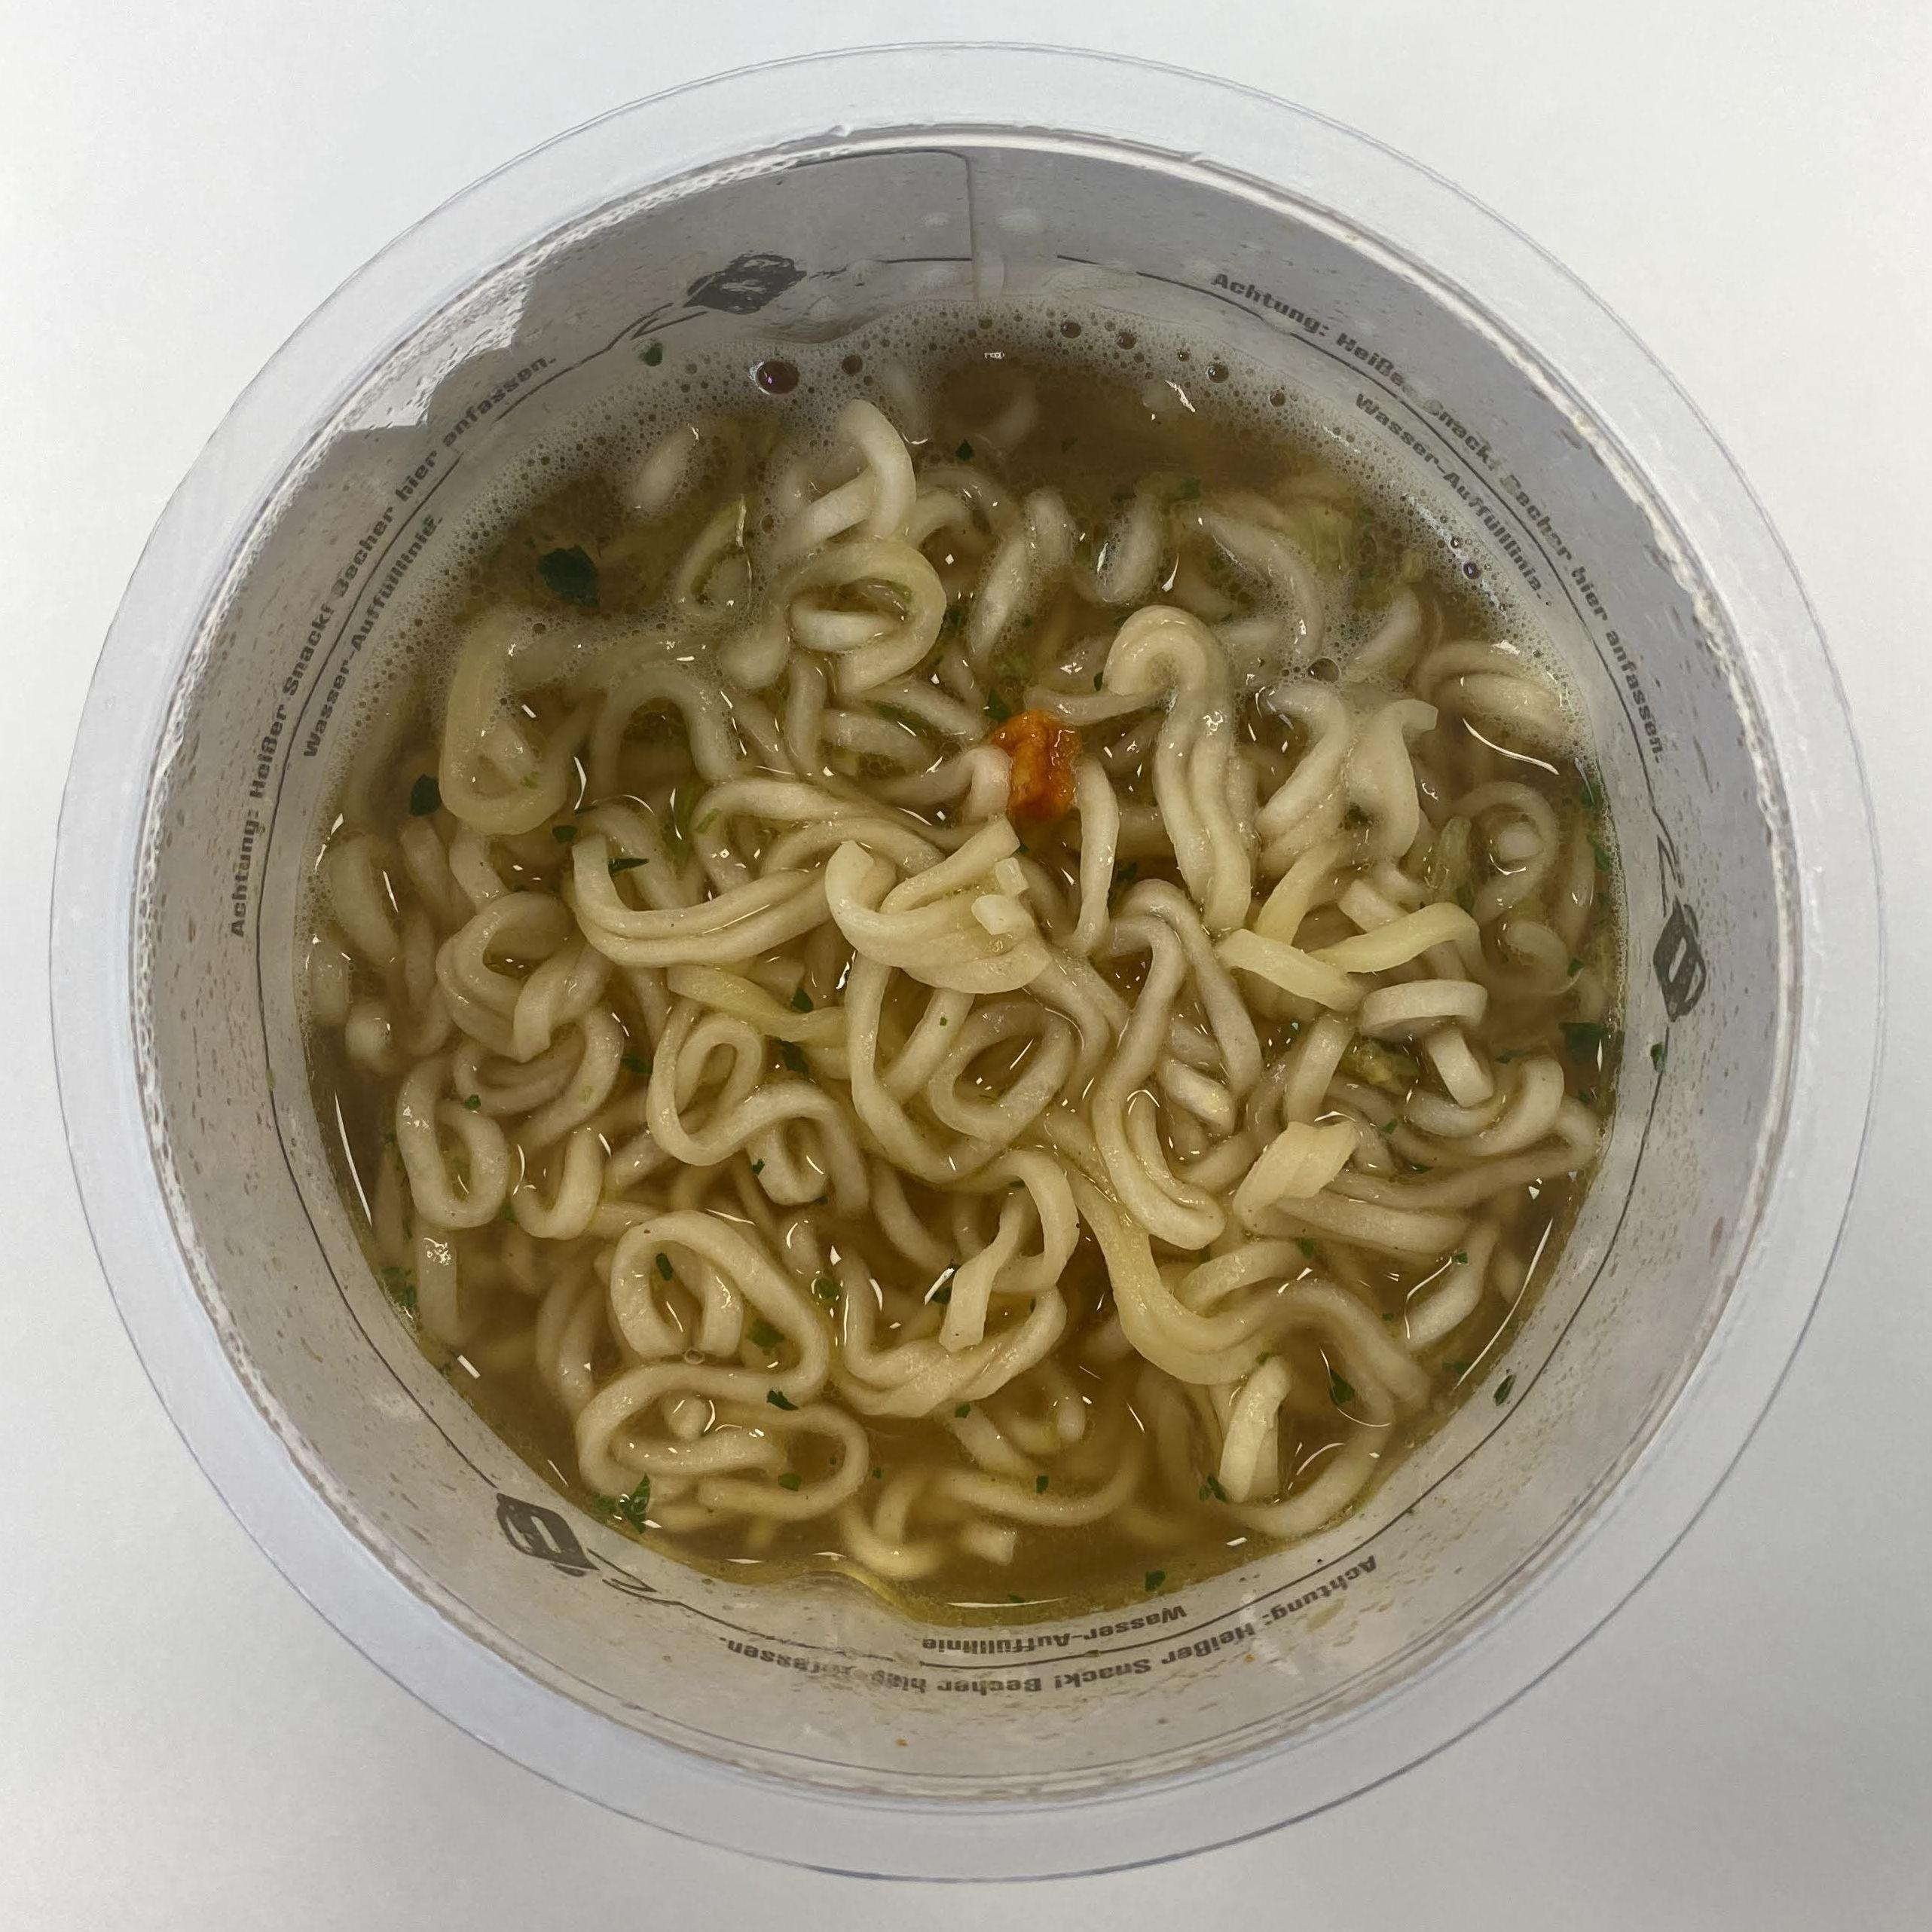 https://www.knorr.com/de/produkte/KNORR-snacks-und-fertiggerichte/asia-noodles.html